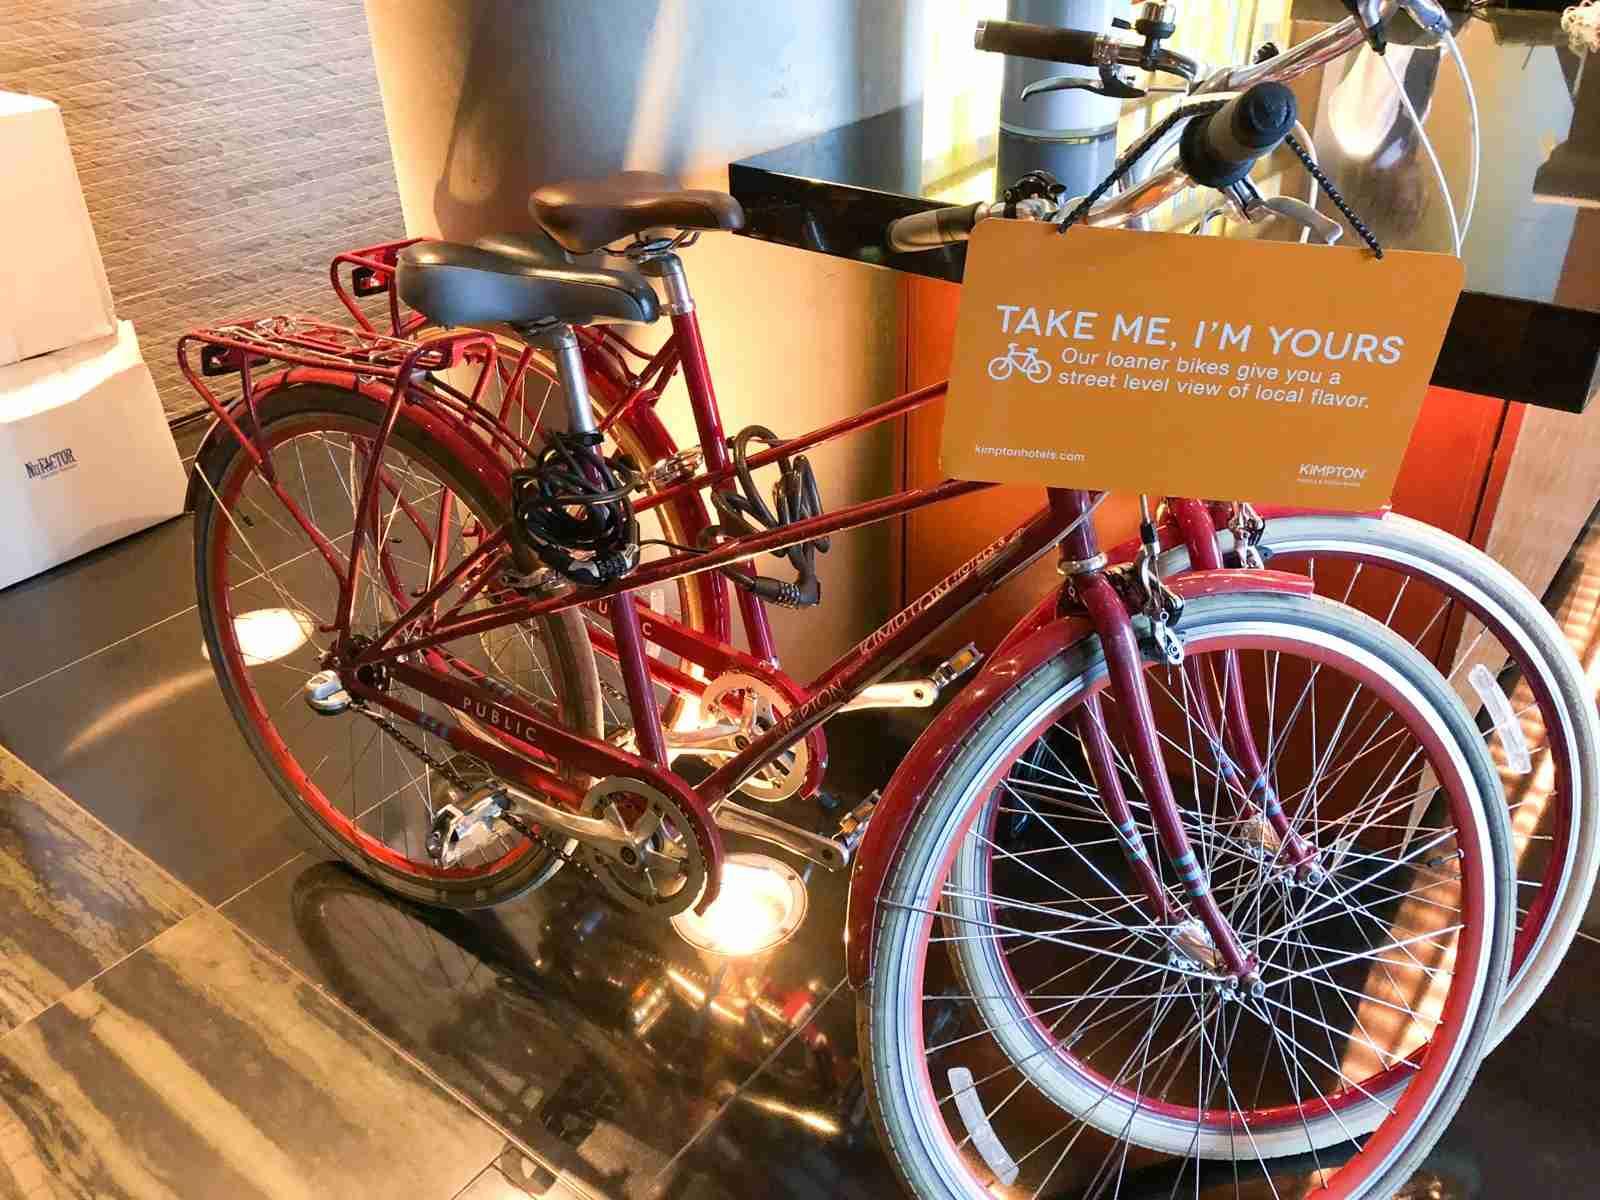 Bikes to borrow at Kimpton Ink48. (Photo by Summer Hull/The Points Guy)